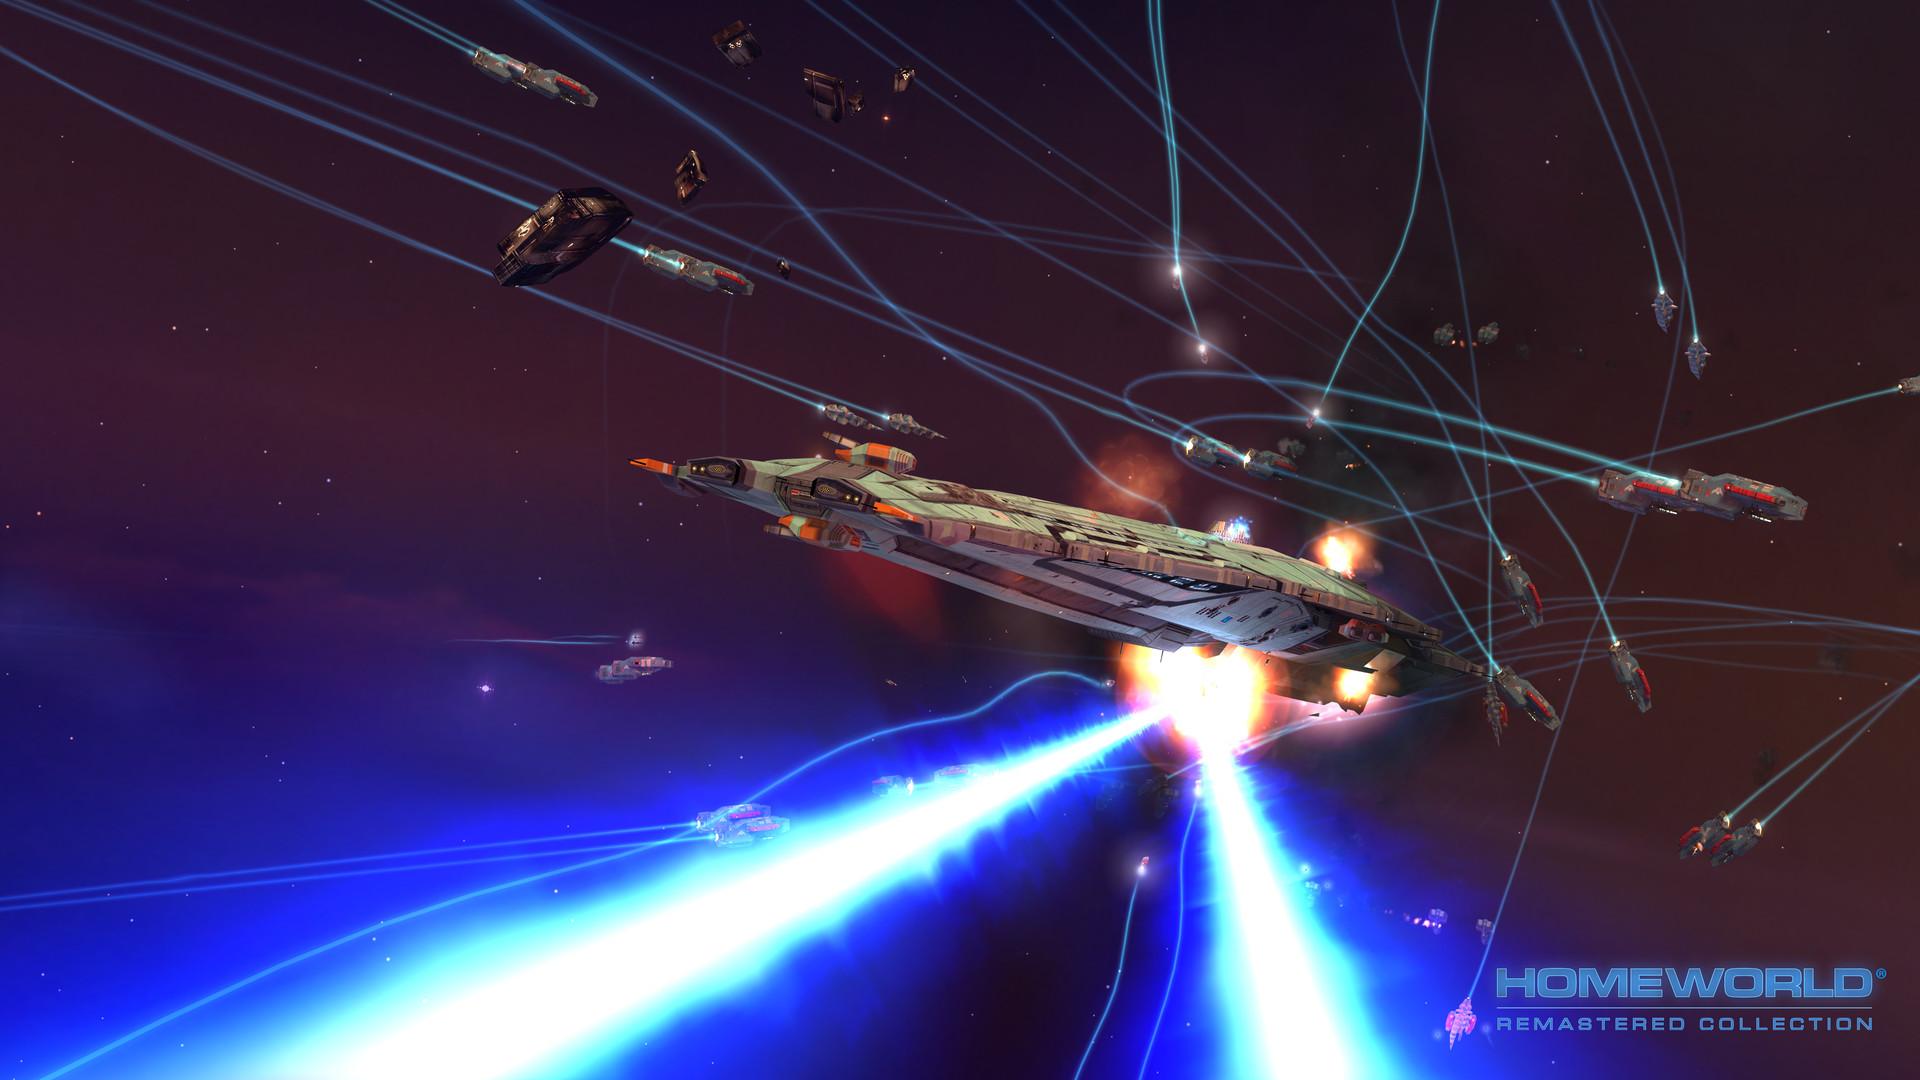 Homeworld Remastered Collection screenshot 1